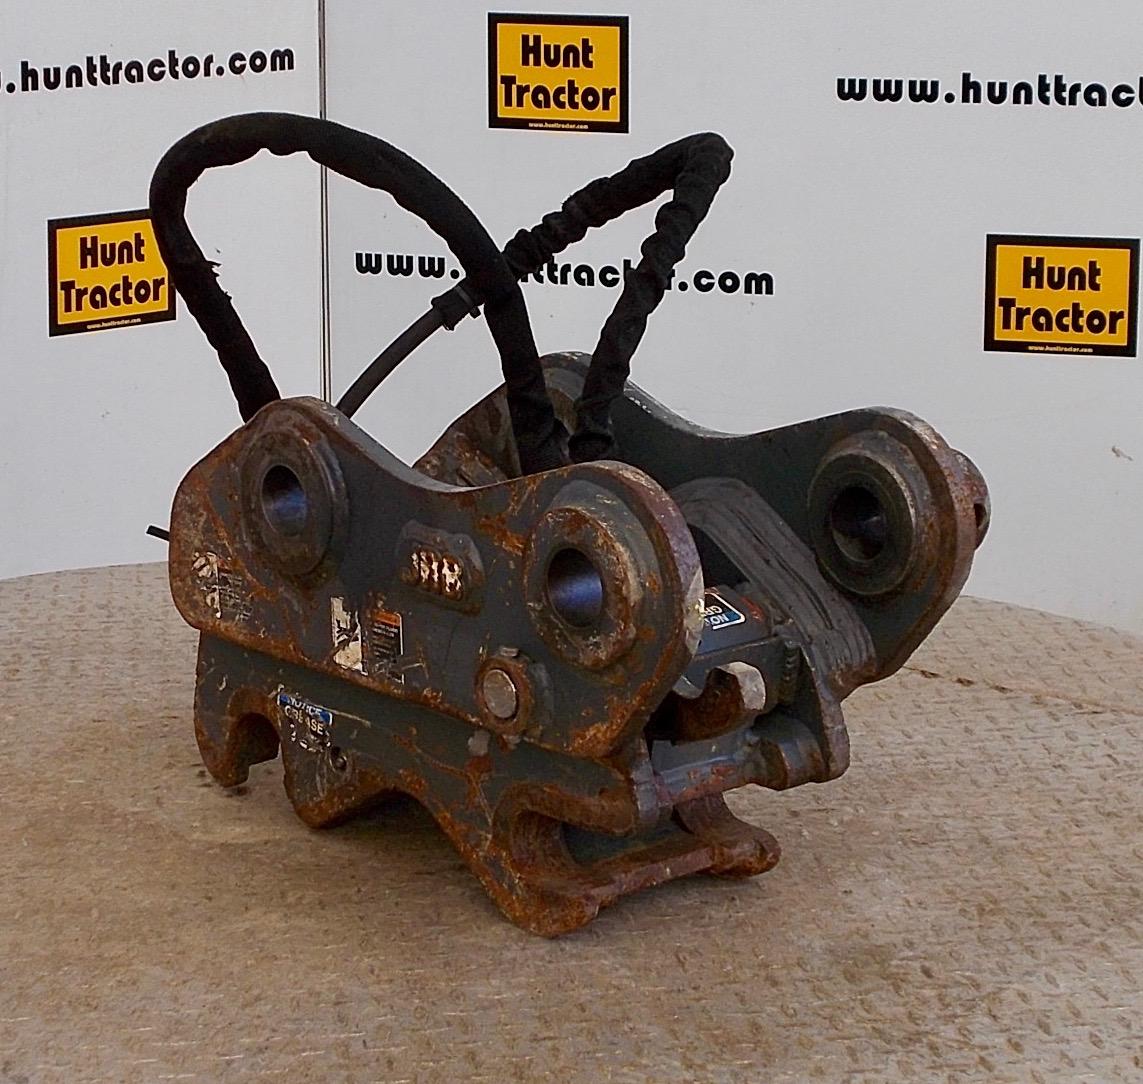 how to change hydraulic fluid in john deere tractor